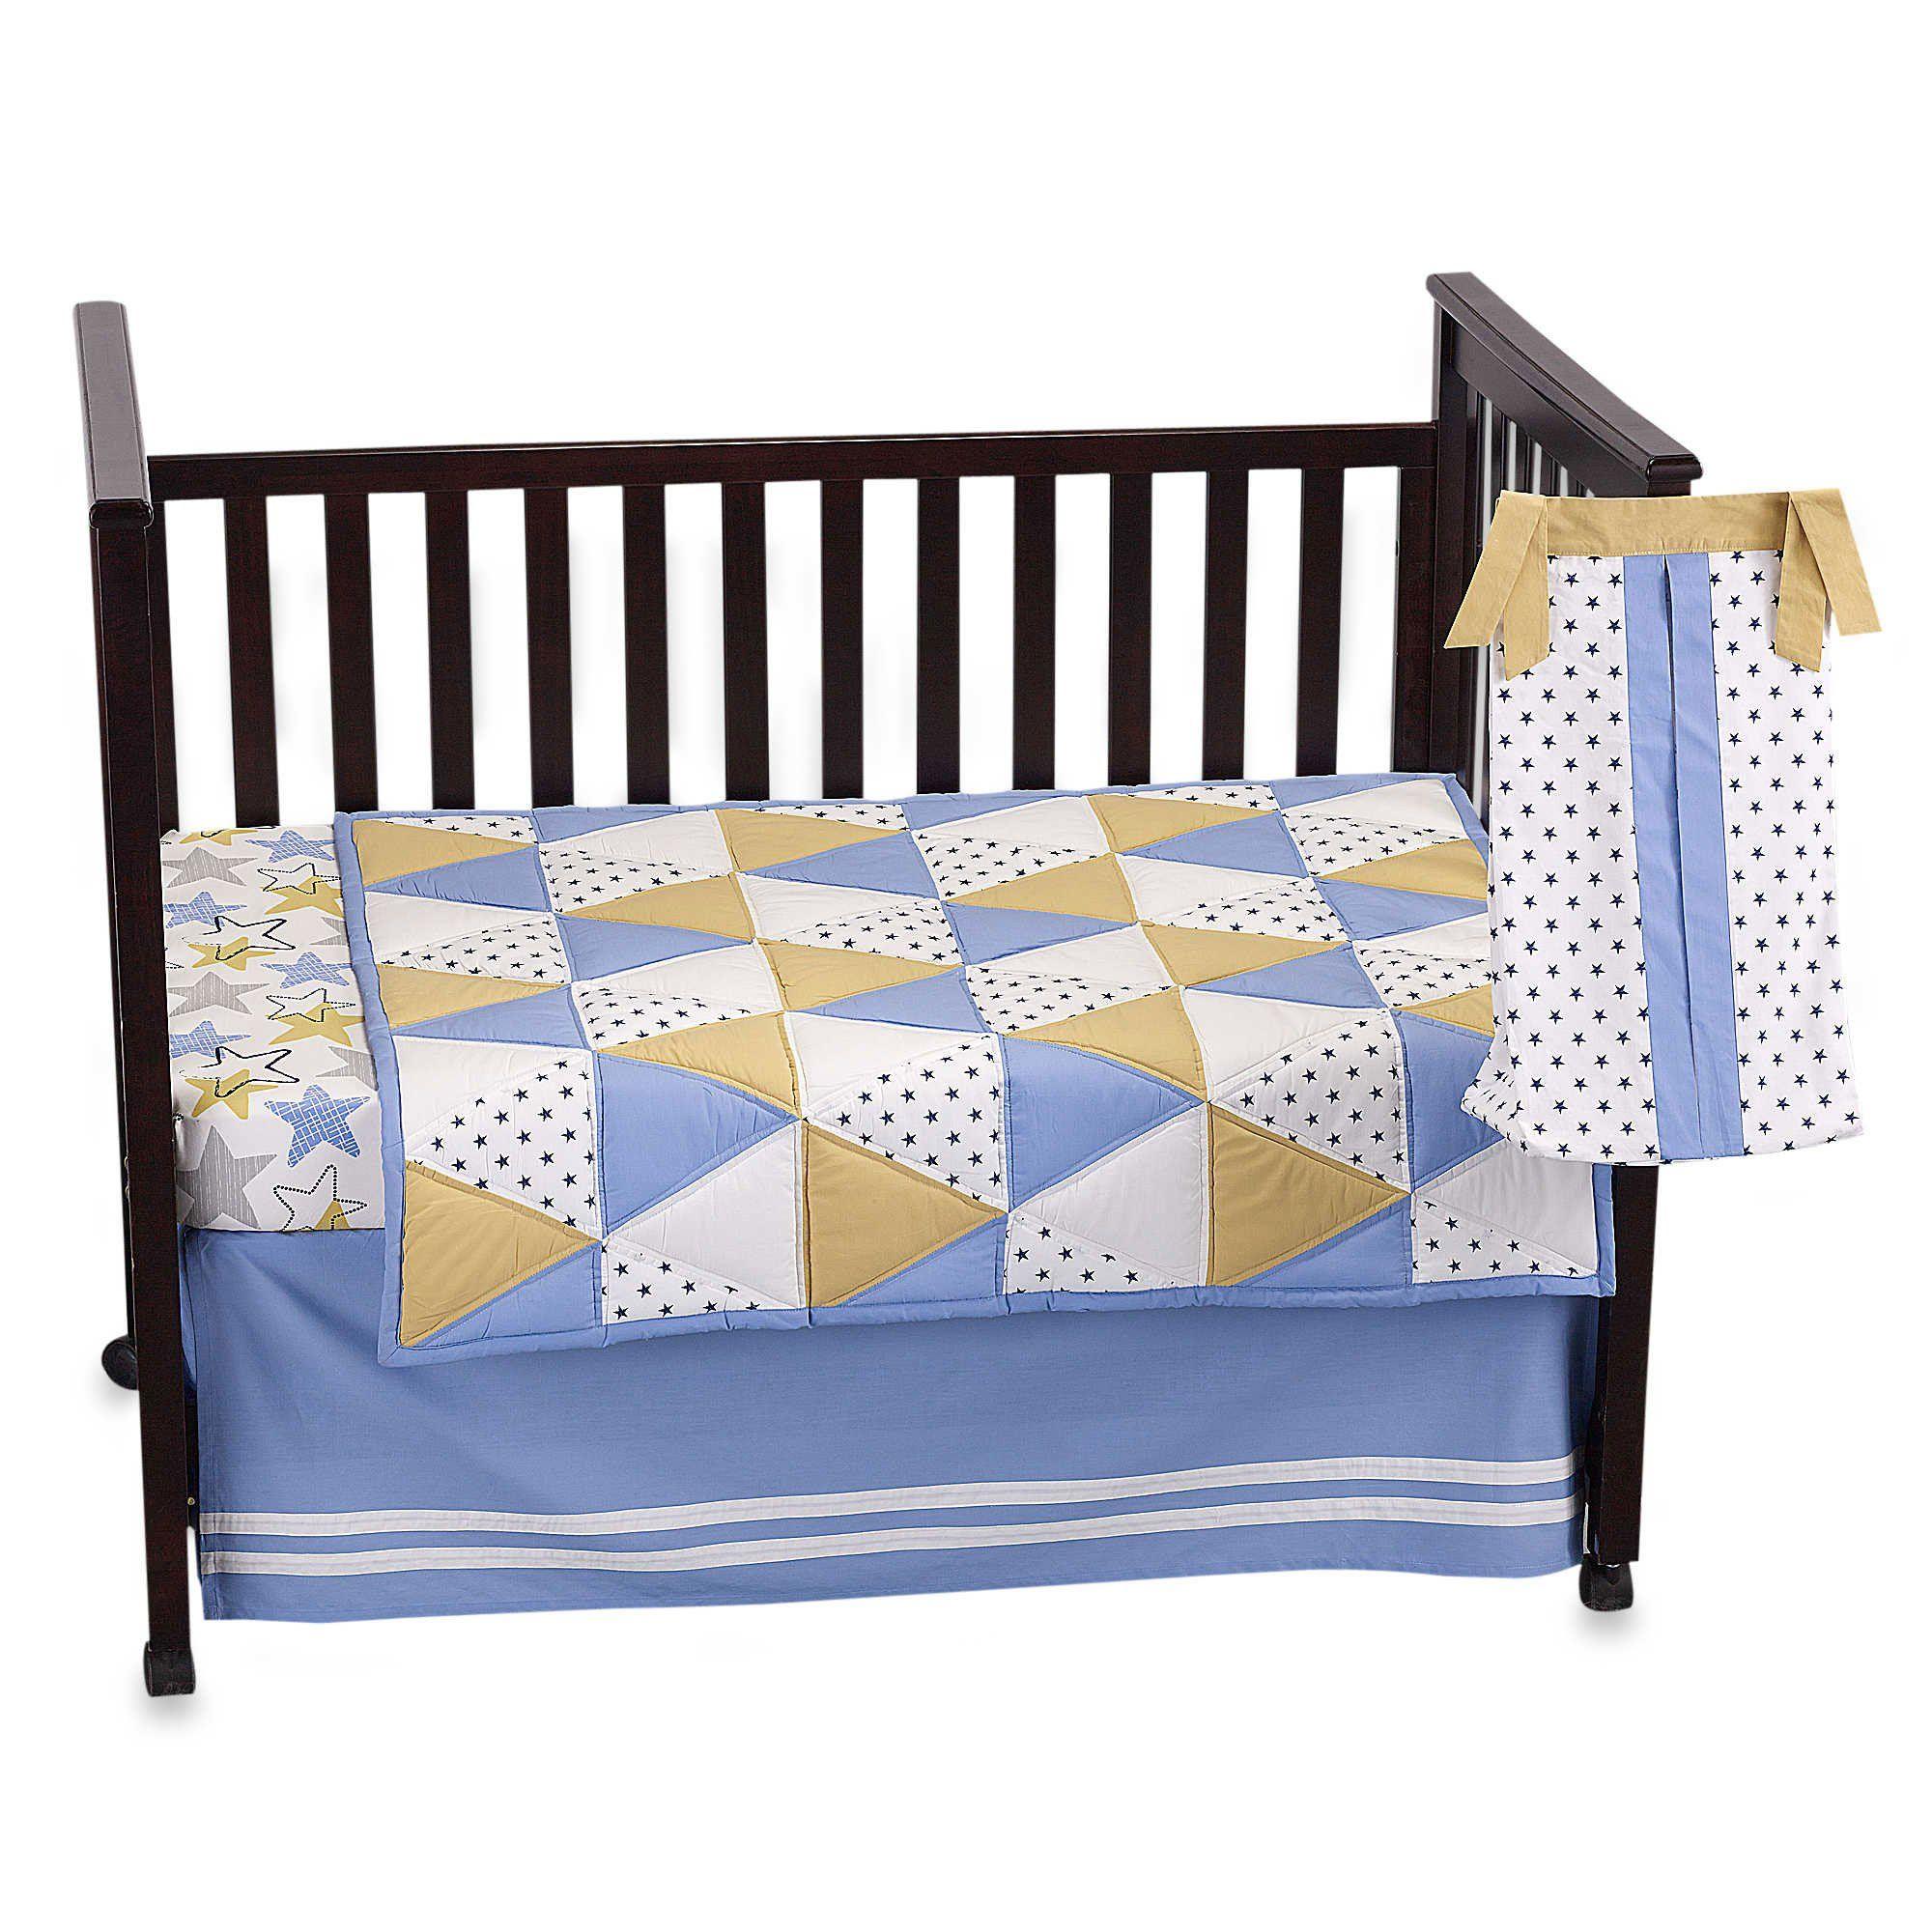 stargazer celestial 8 piece baby crib bedding set baby product